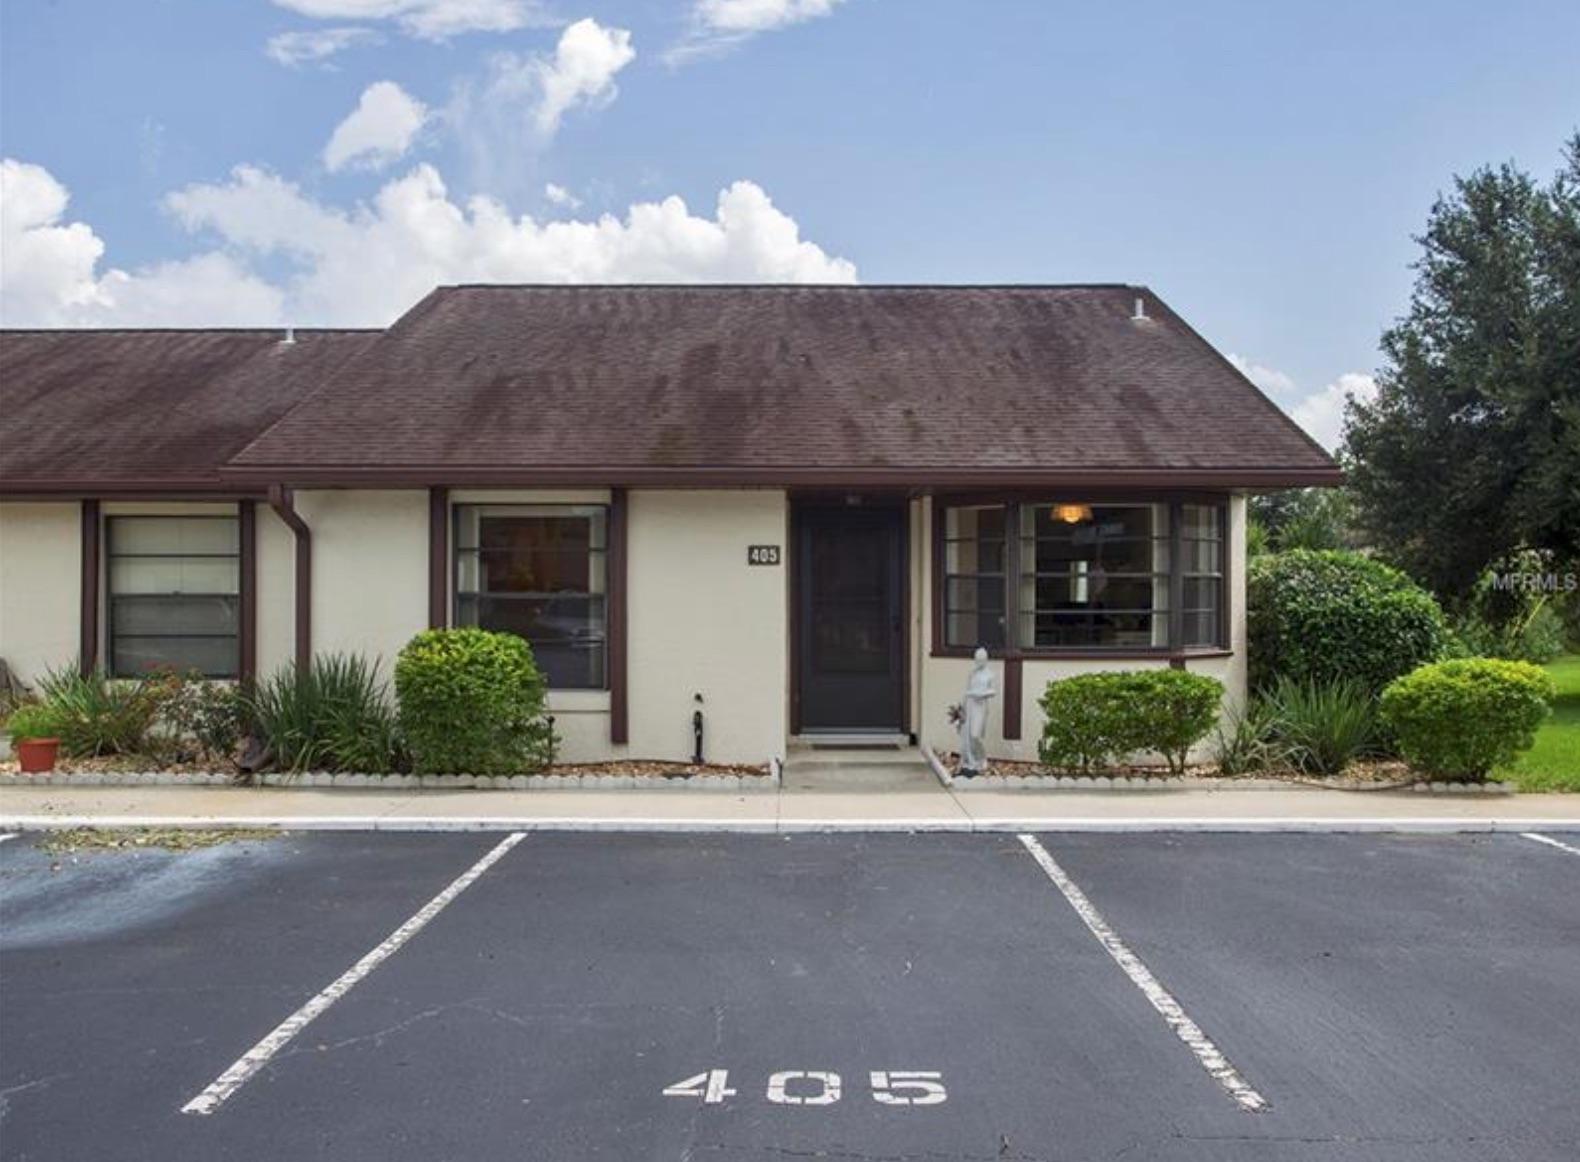 405 TERRACE HILL BLVD, #5G, DEBARY, FL 32713